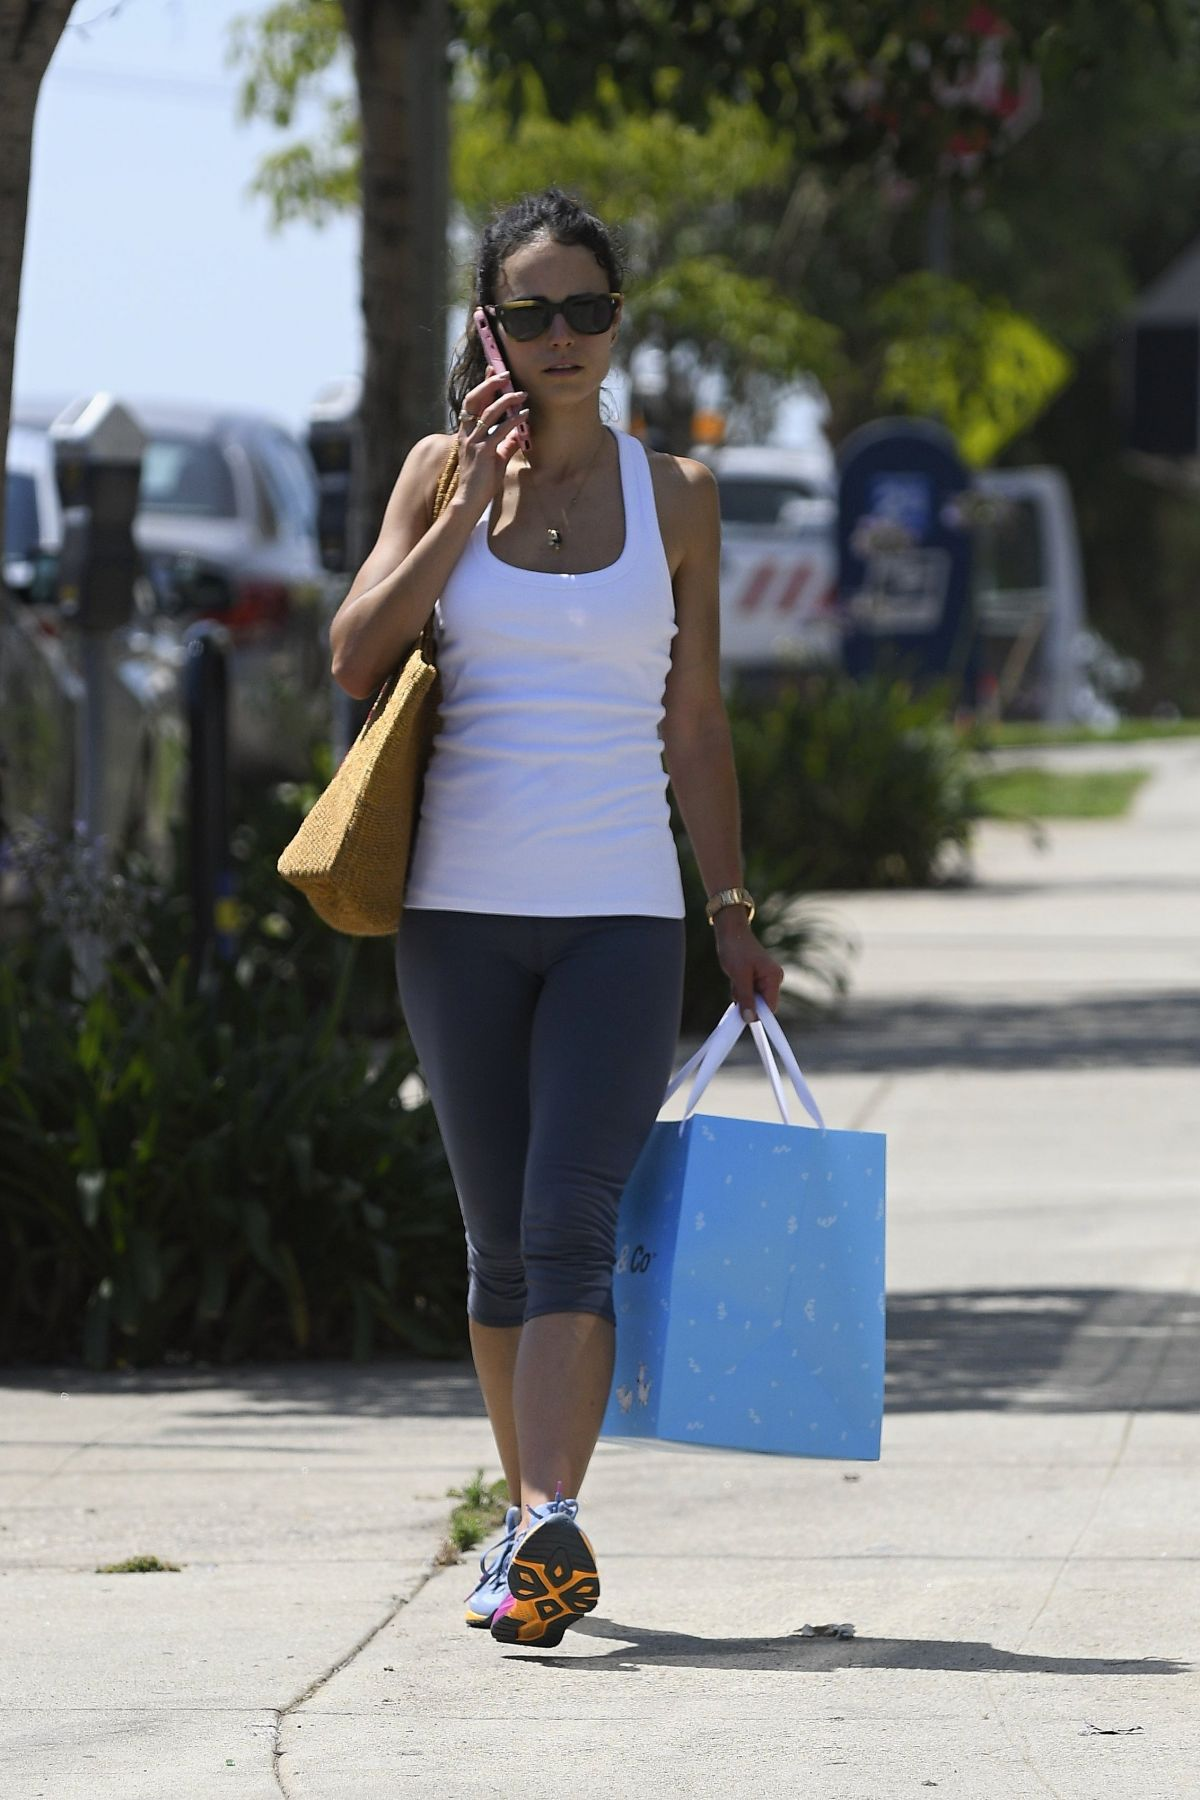 JORDANA BREWSTER in Leggings Out Shopping in Los Angeles 07/08/2017